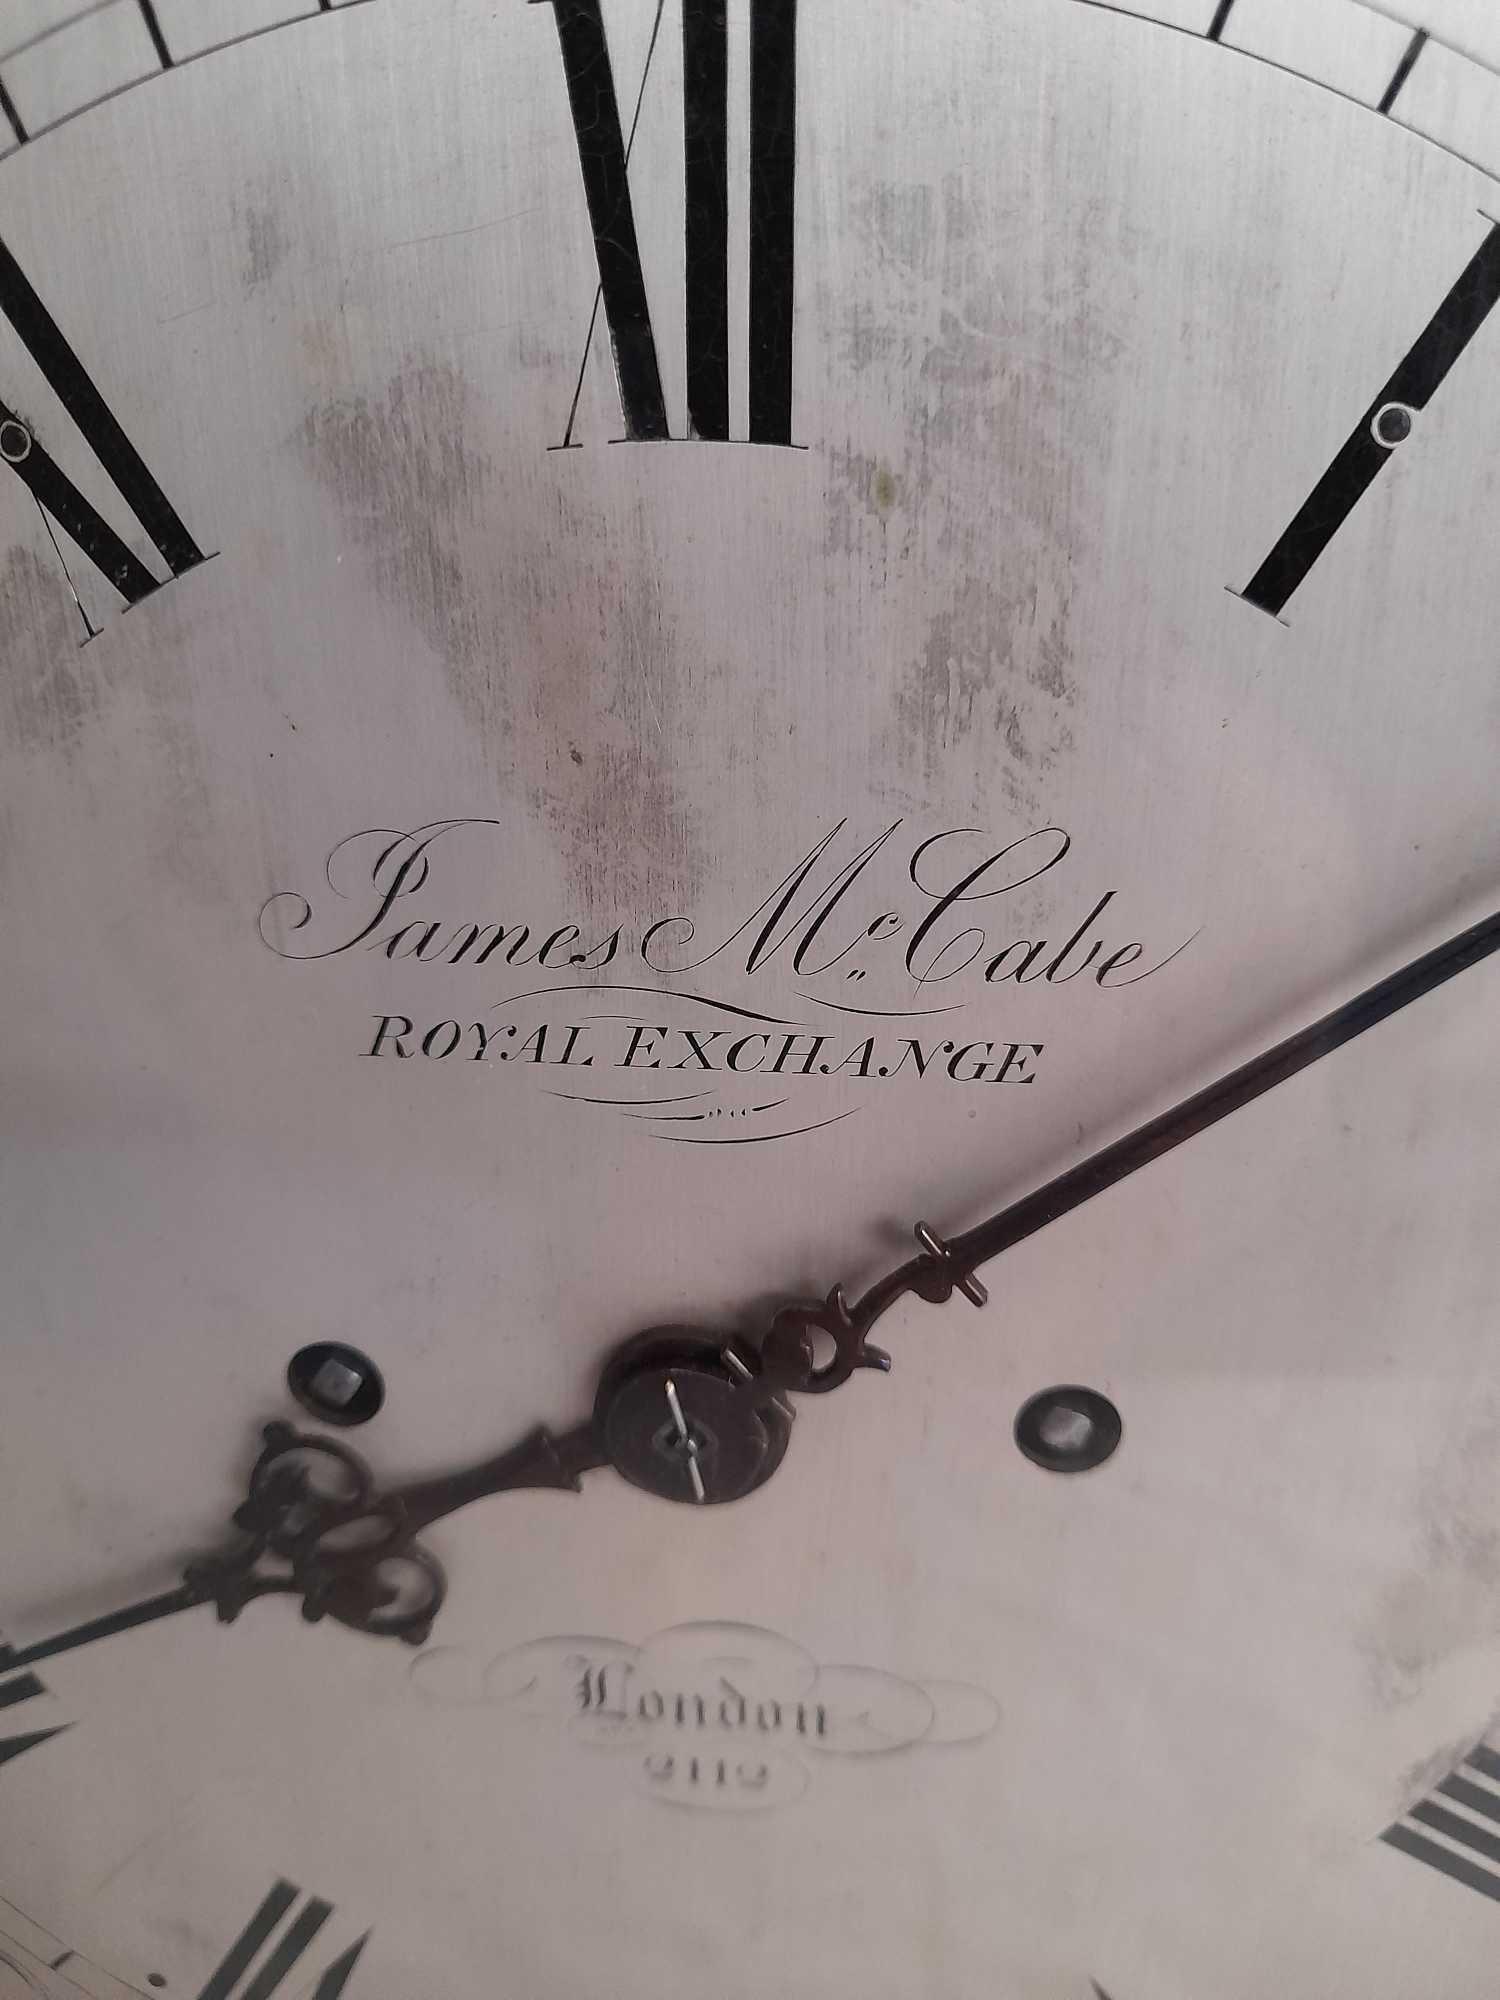 JAMES McCABE LONDON CLOCK - Image 2 of 16